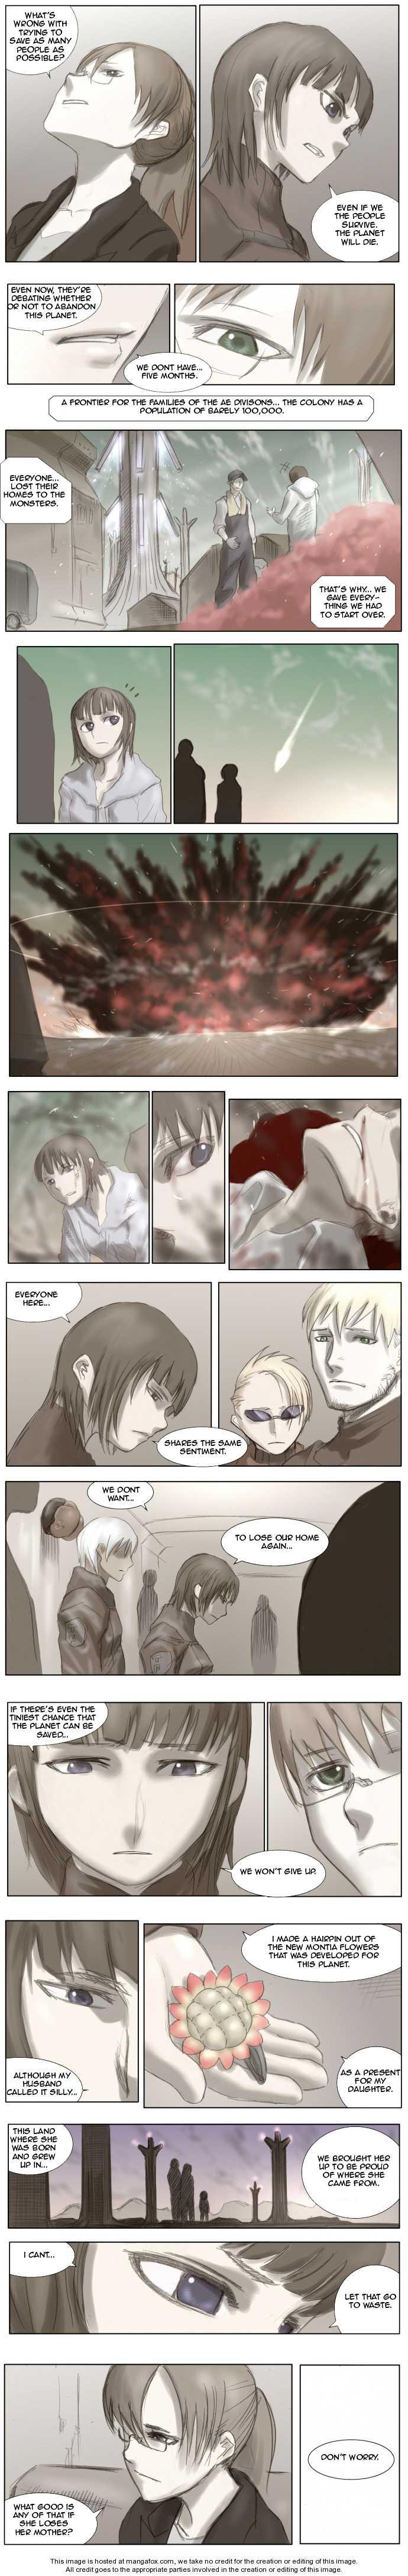 Knight Run 2 Page 2